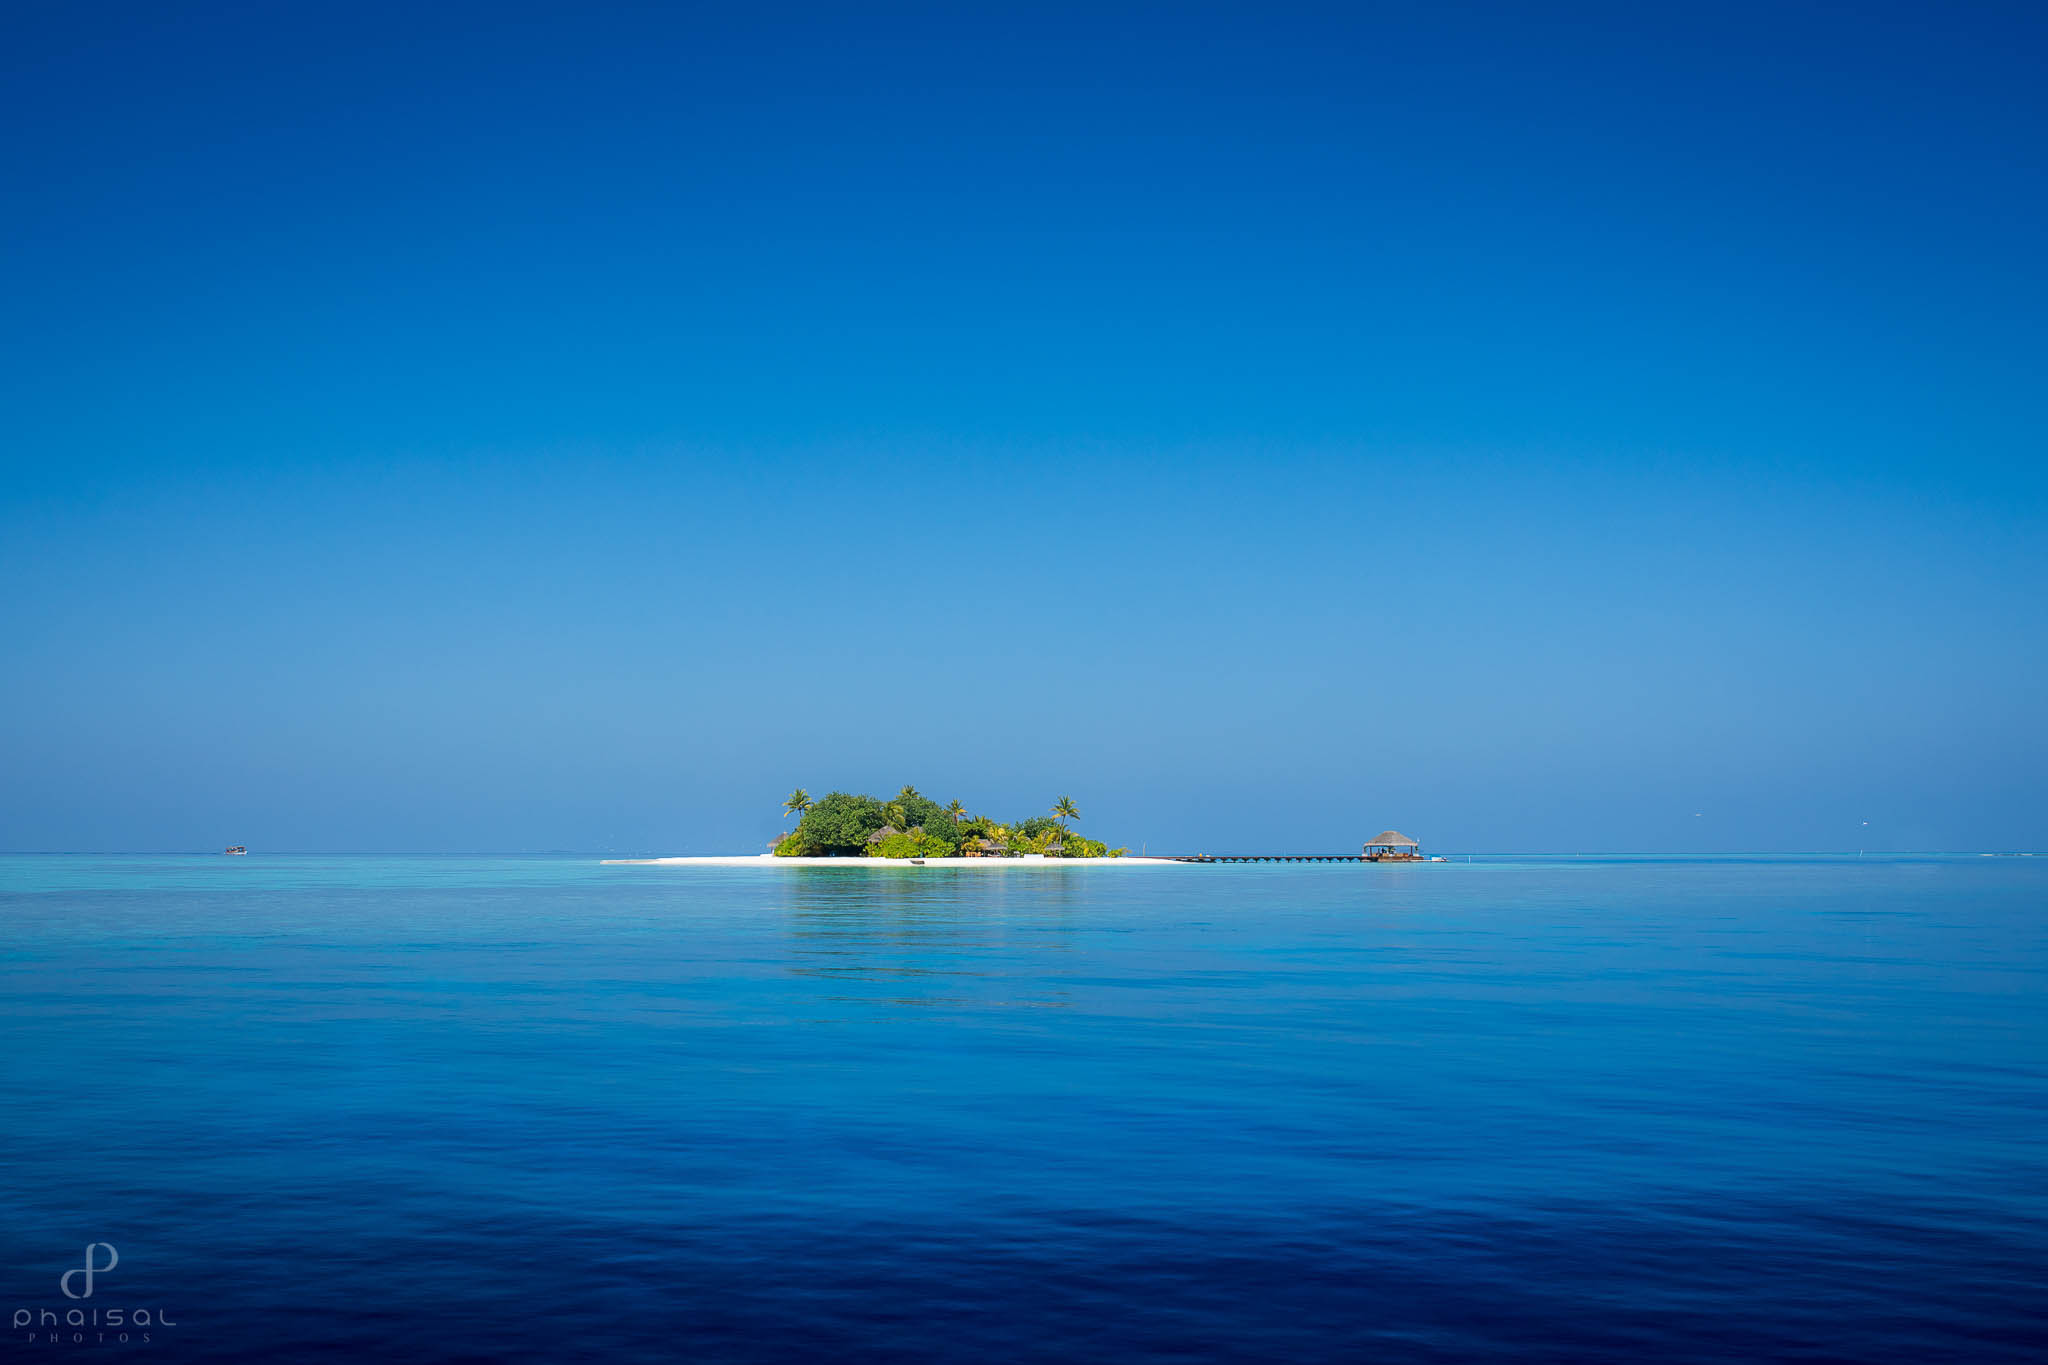 Maldives photo by phaisalphotos